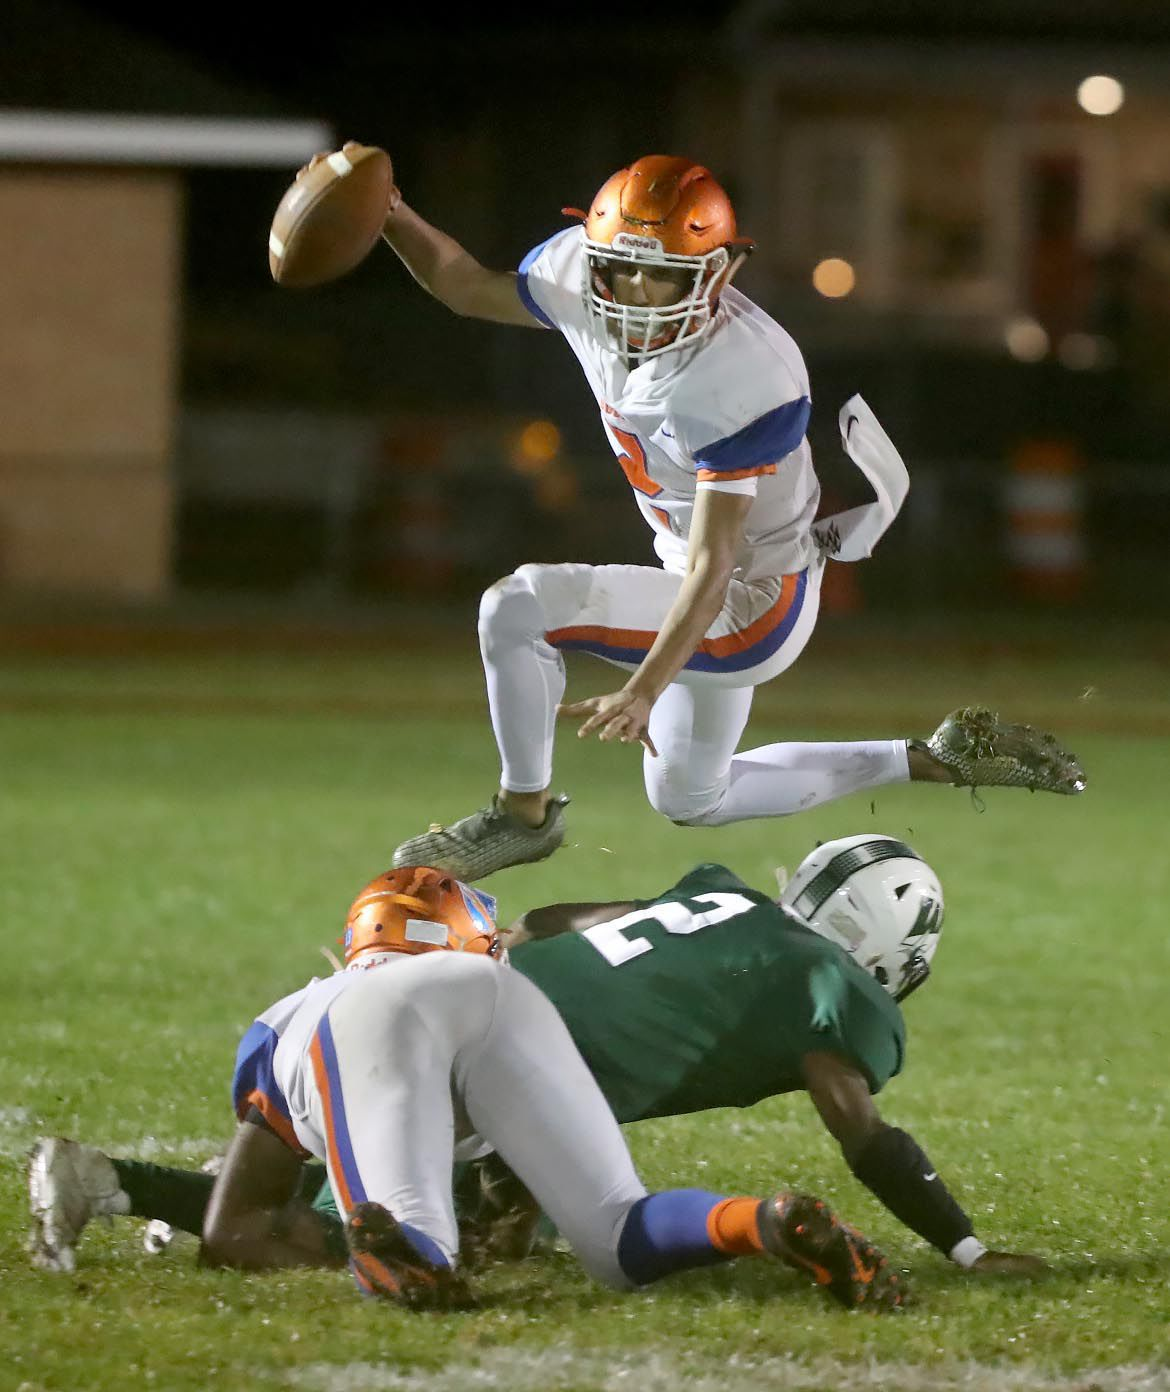 Millville Vs Winslow Township High School Football Game High